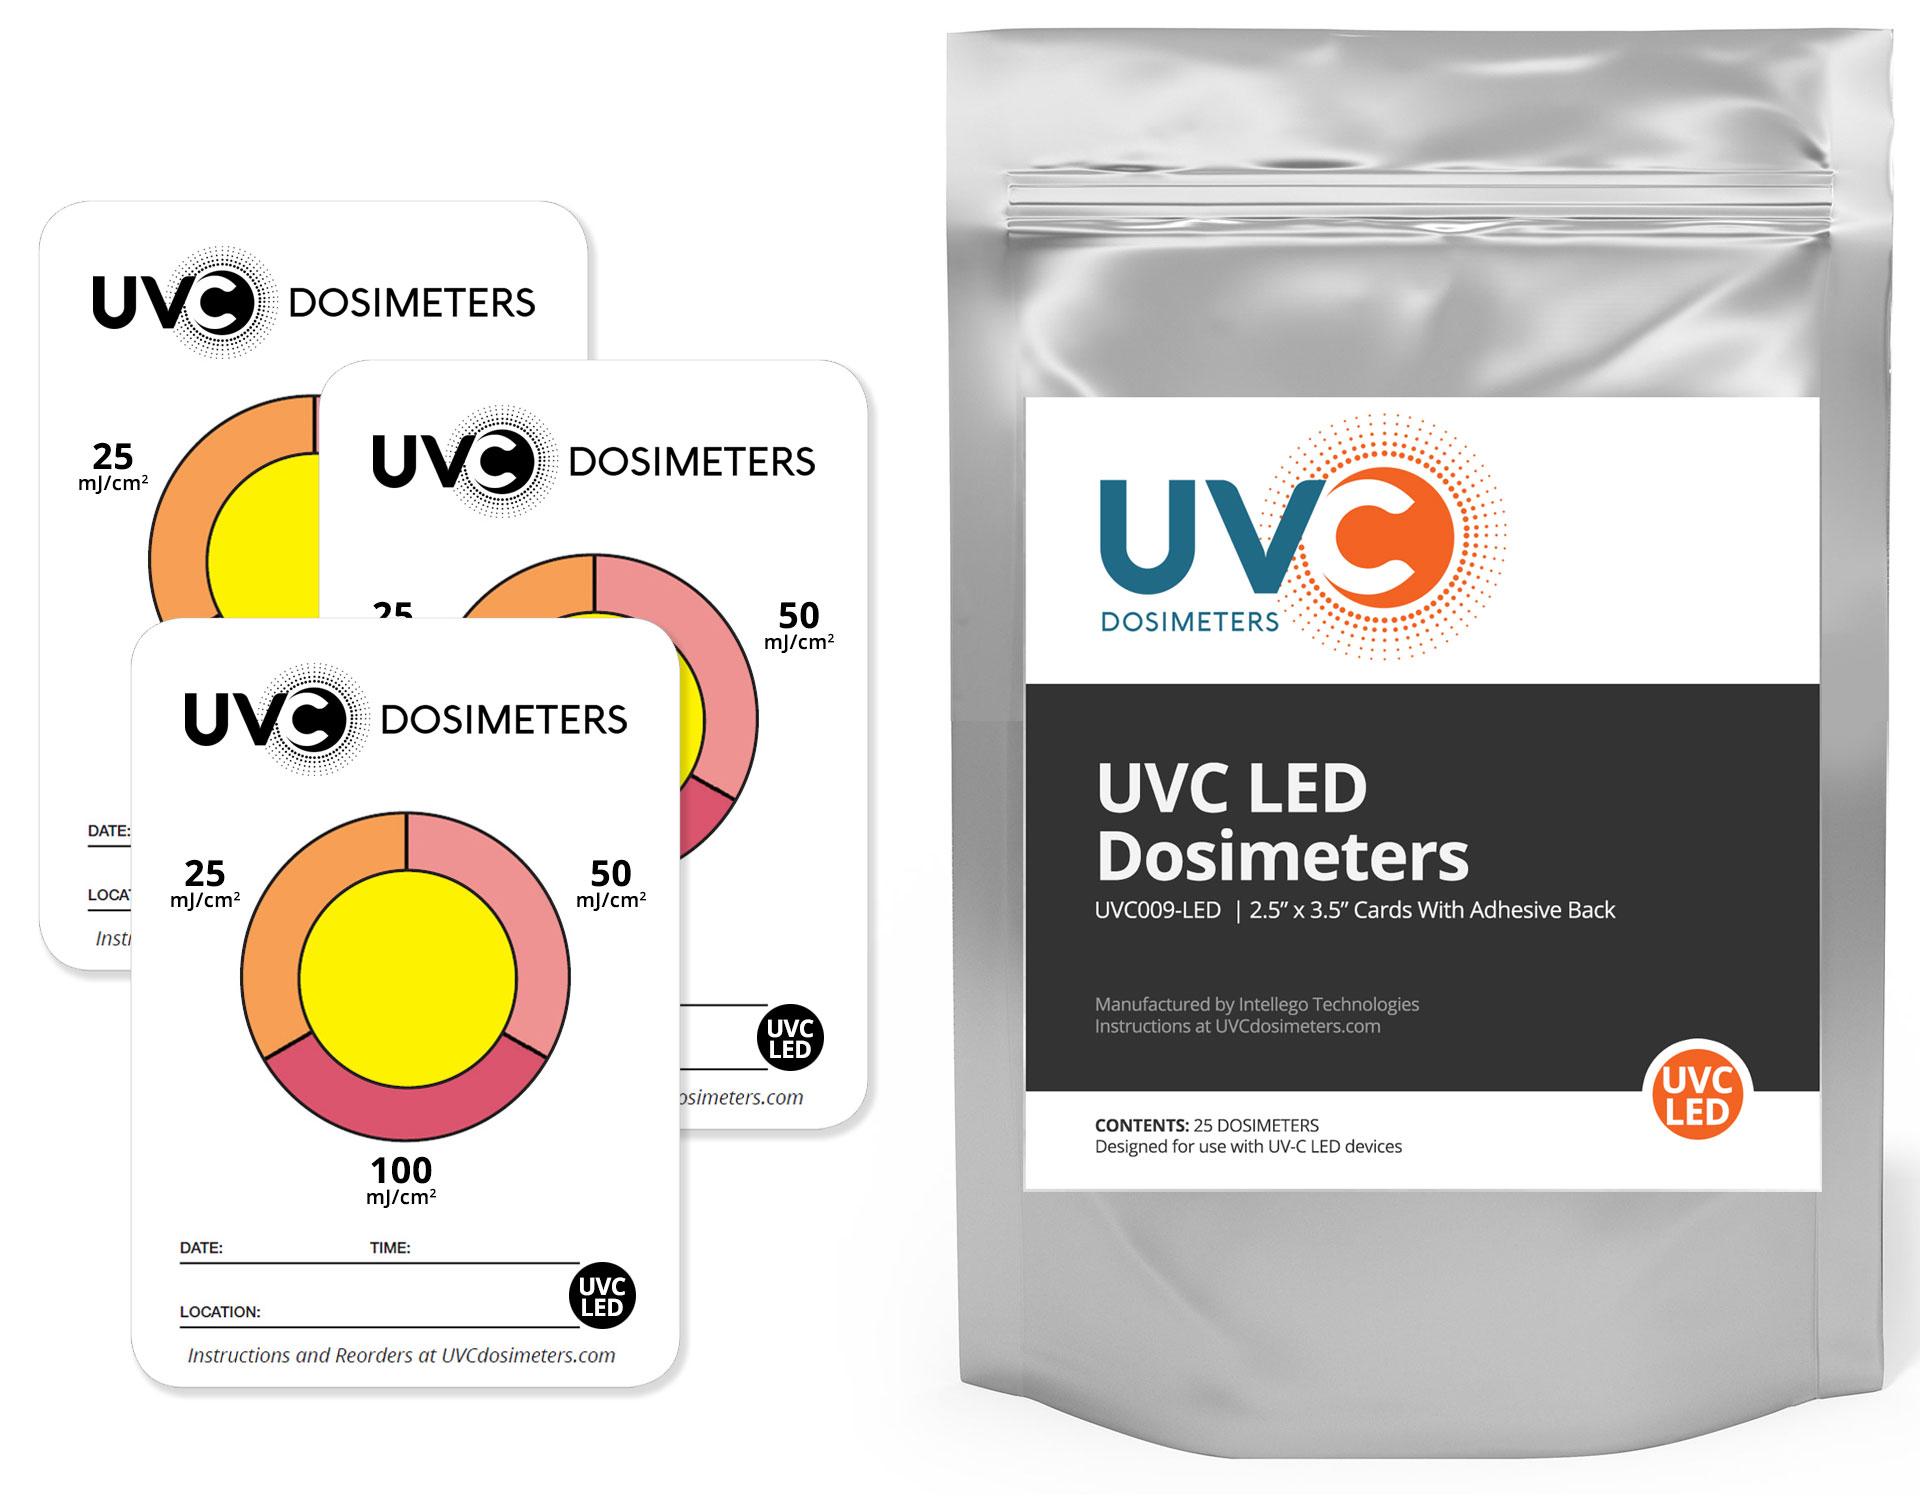 UVC LED dosimeters